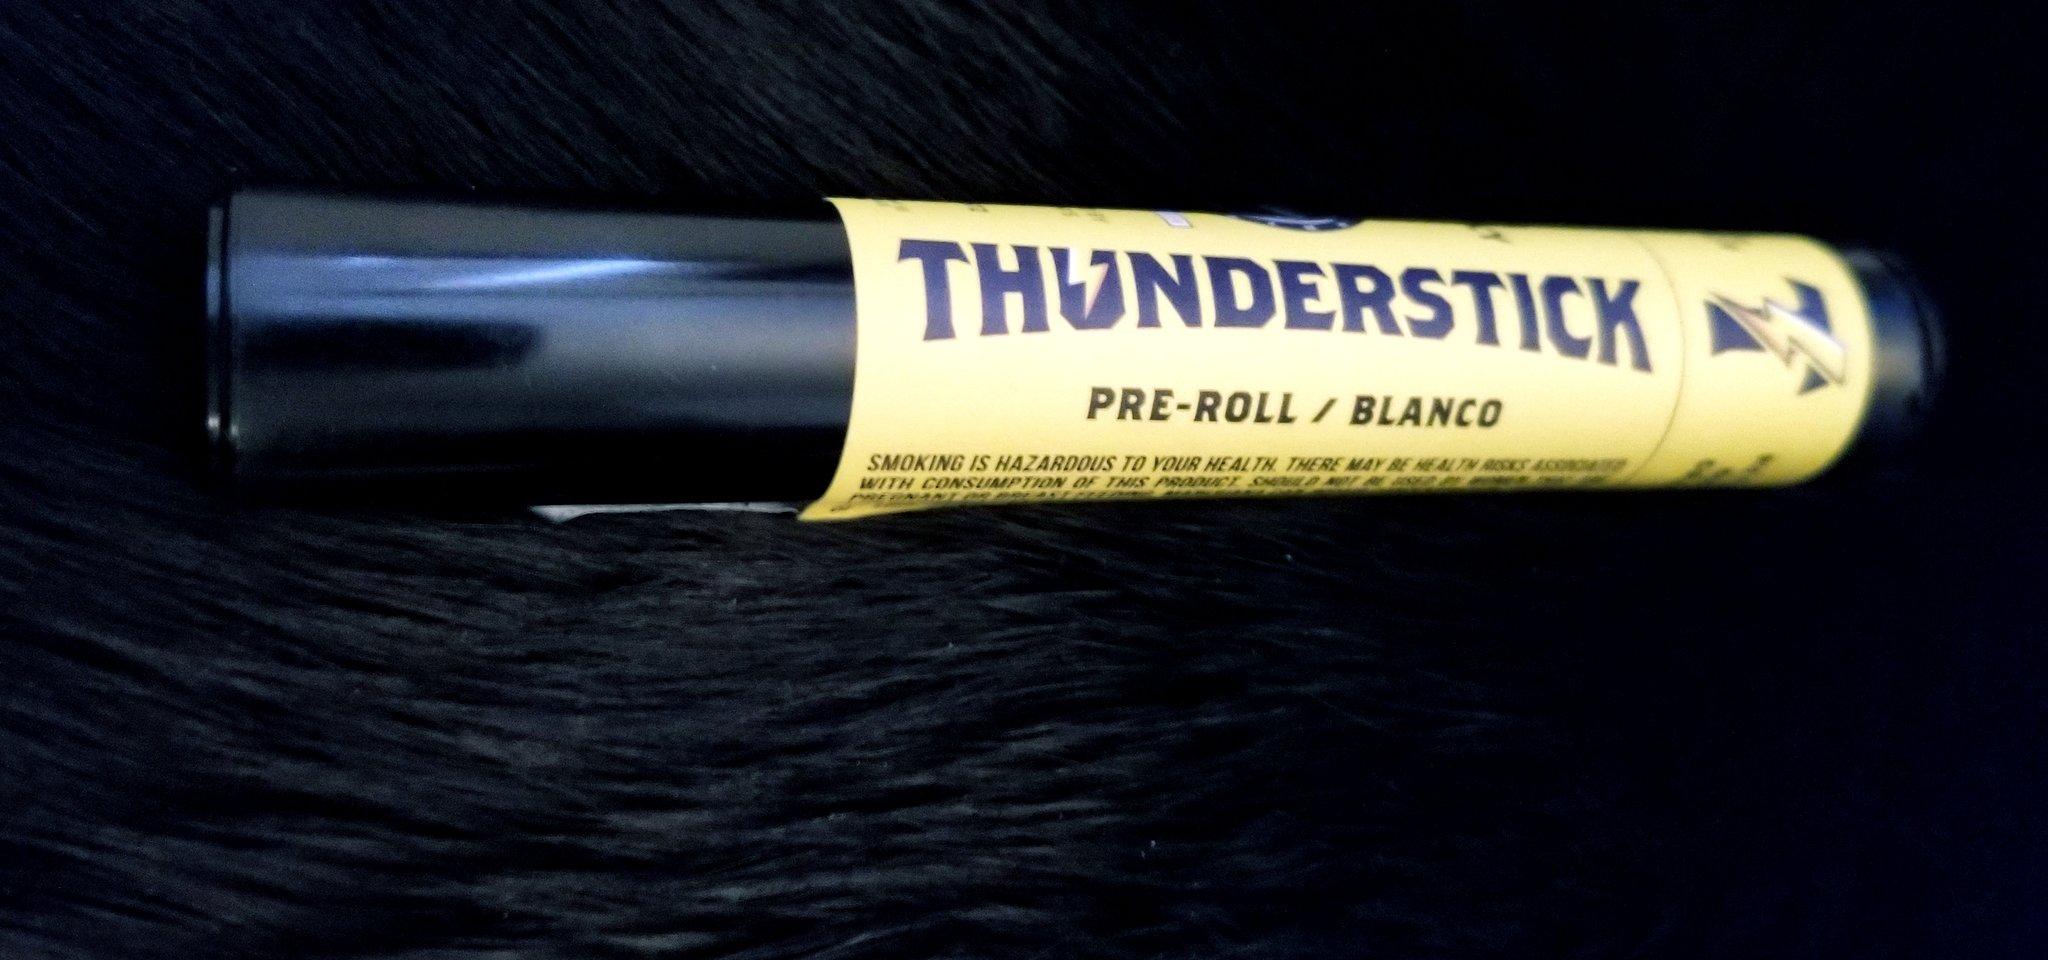 thunderstick joint by interra oils